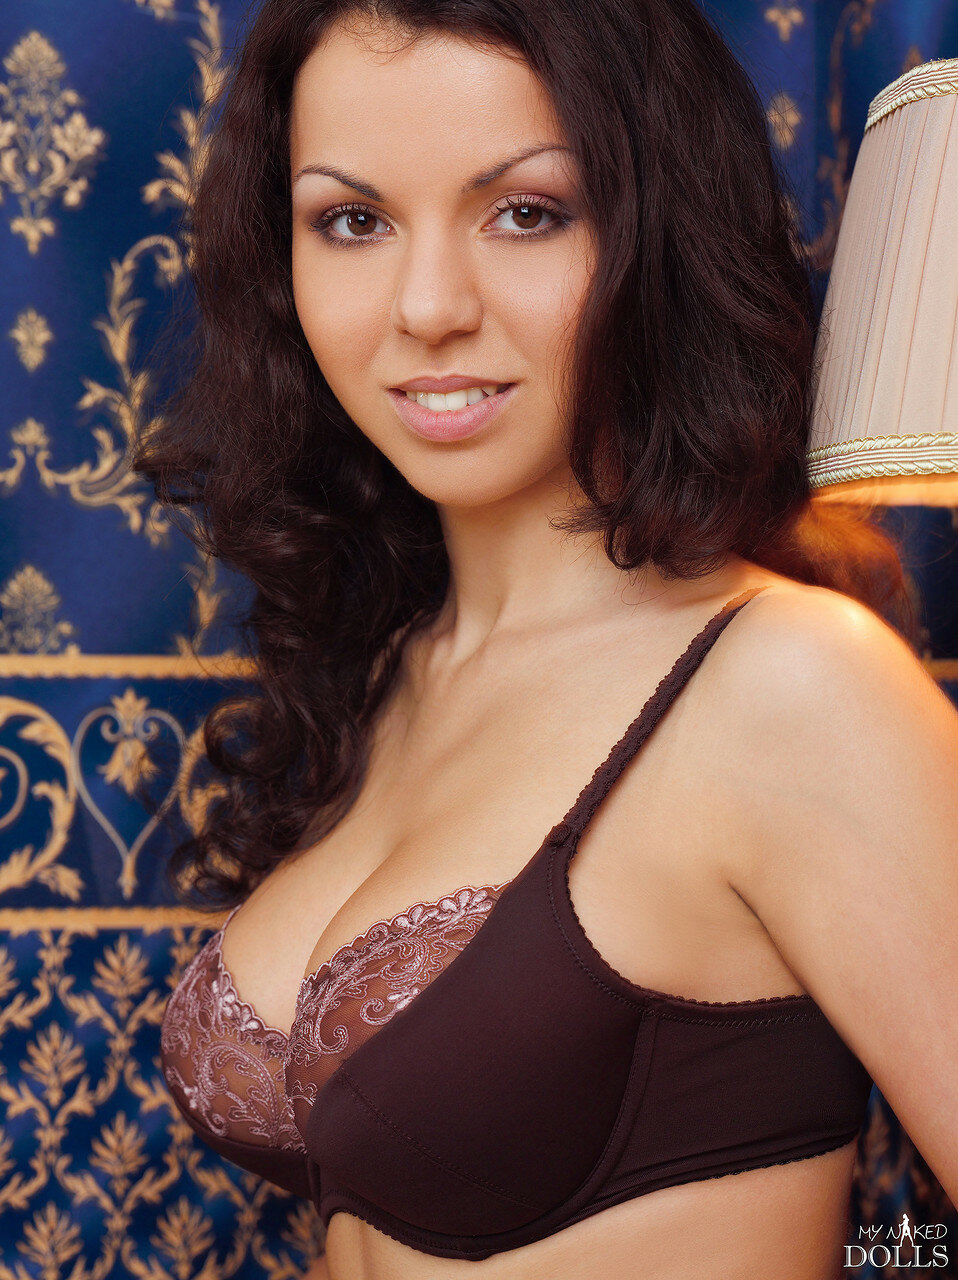 Кристина шмидт порно актриса фото 724-275